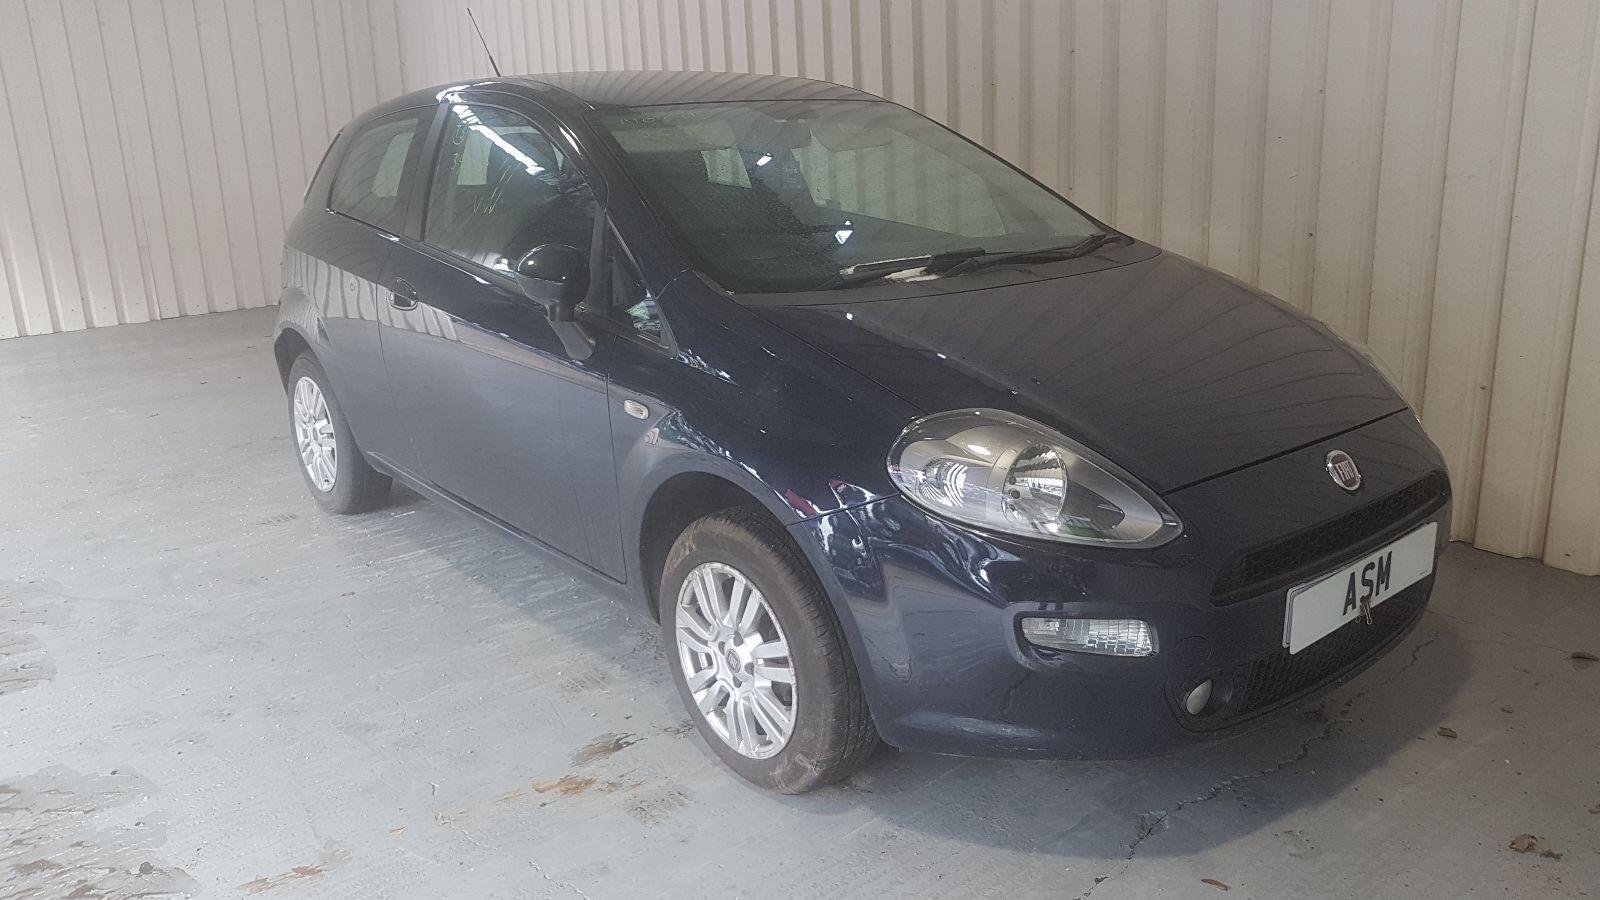 Image for a 2012 Fiat Punto 1.2 Petrol 169A4000 Engine